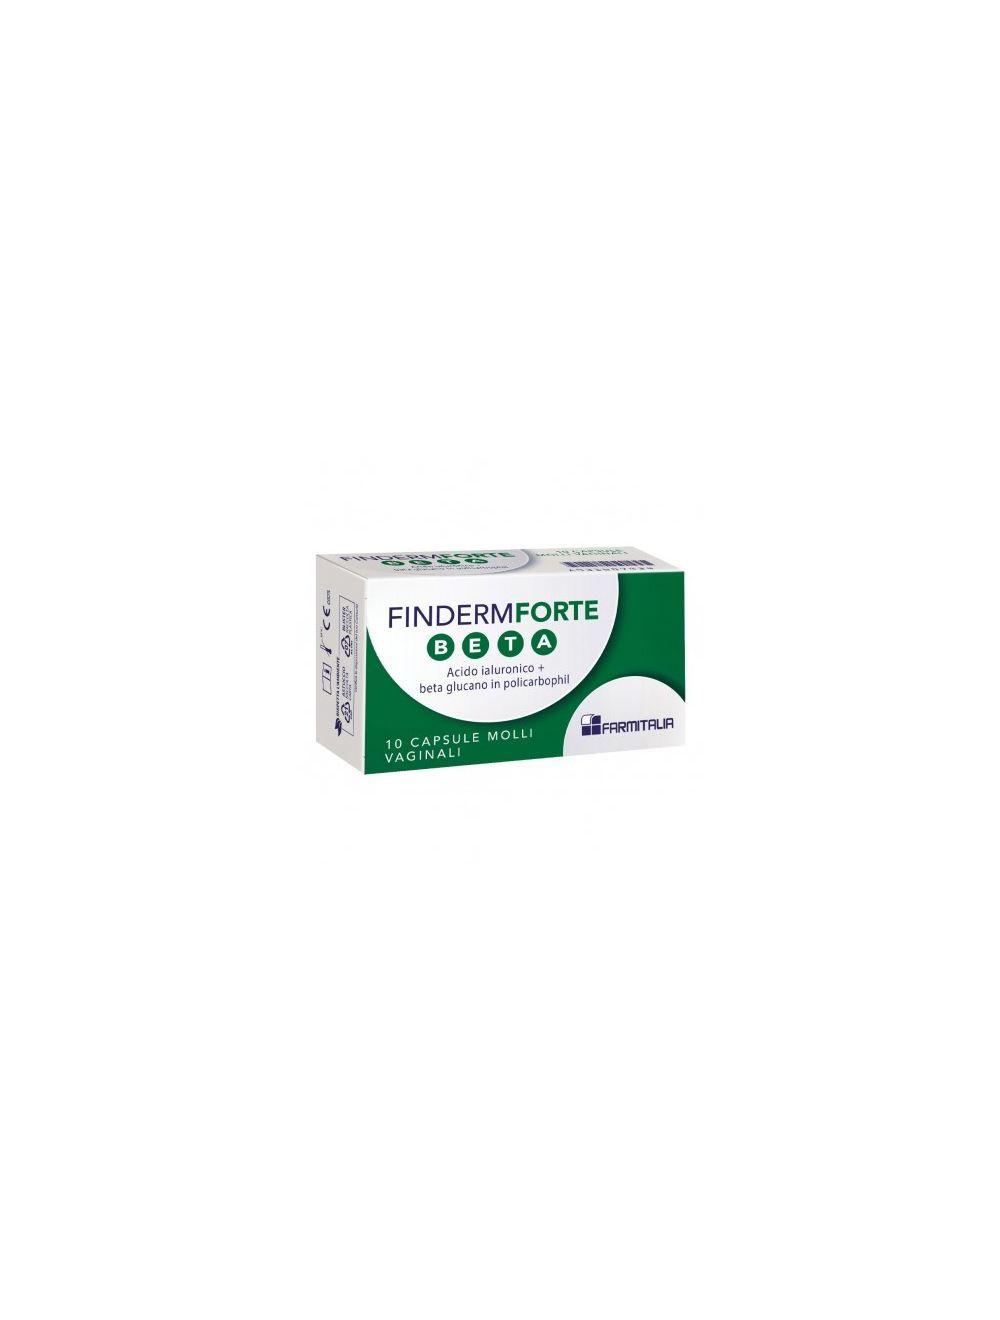 FINDERM FORTE BETA 10 CAPSULE MOLLI - Farmaci.me